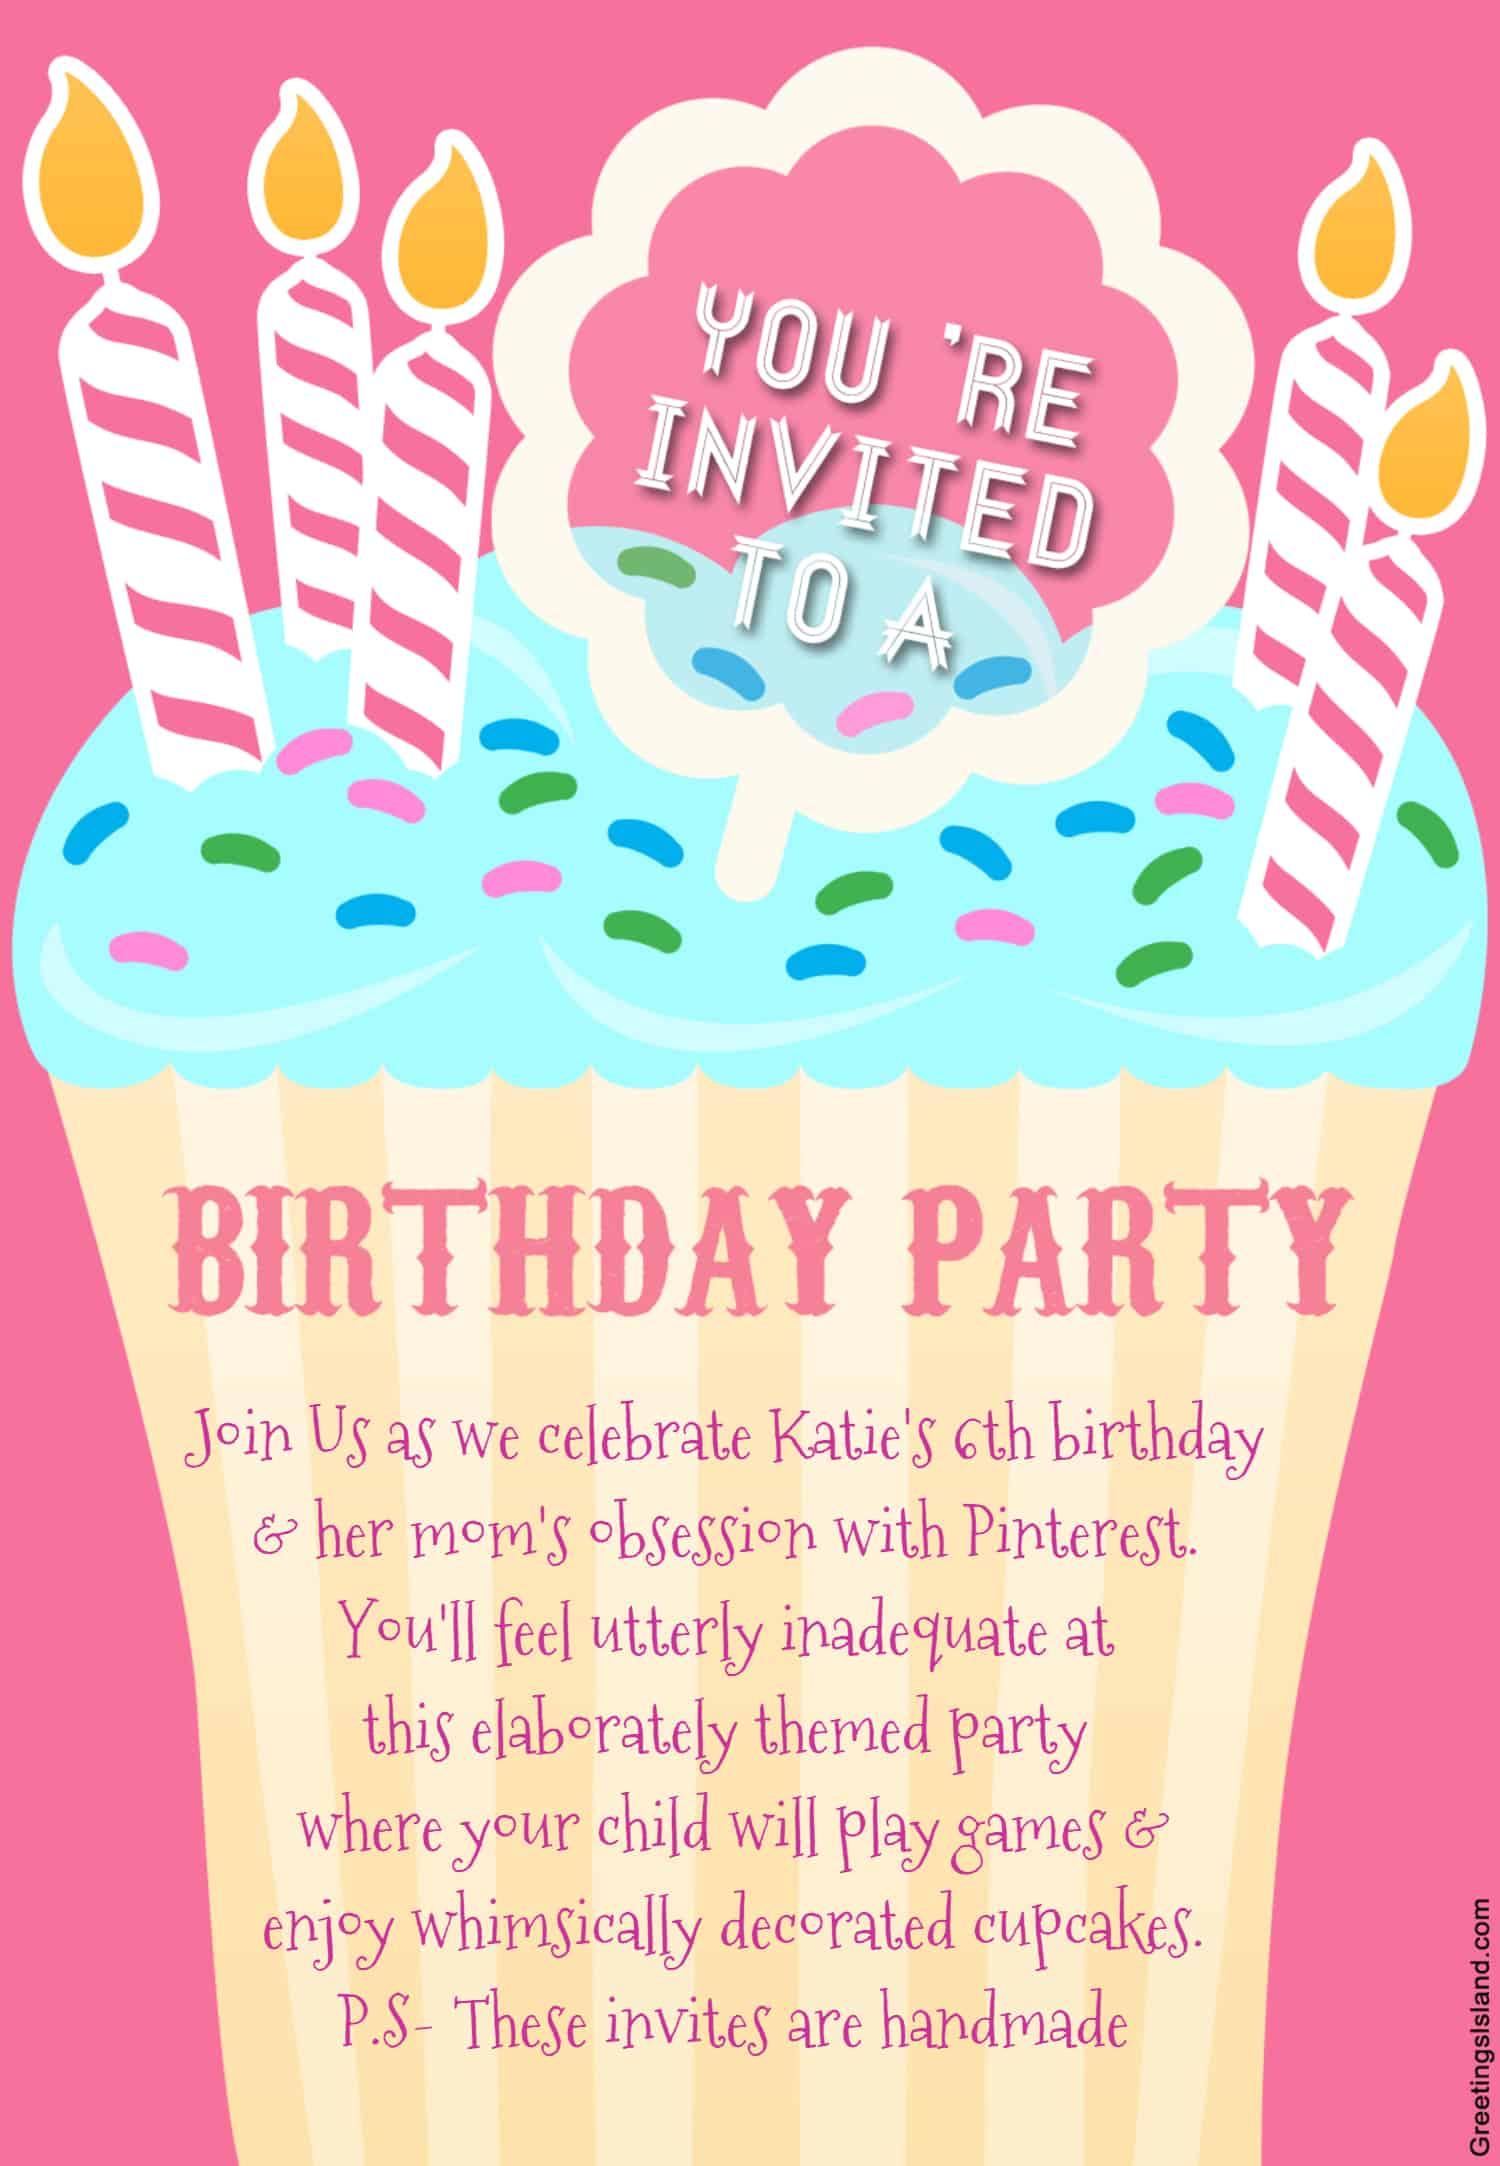 Honest birthday party invitations my invitation stopboris Image collections